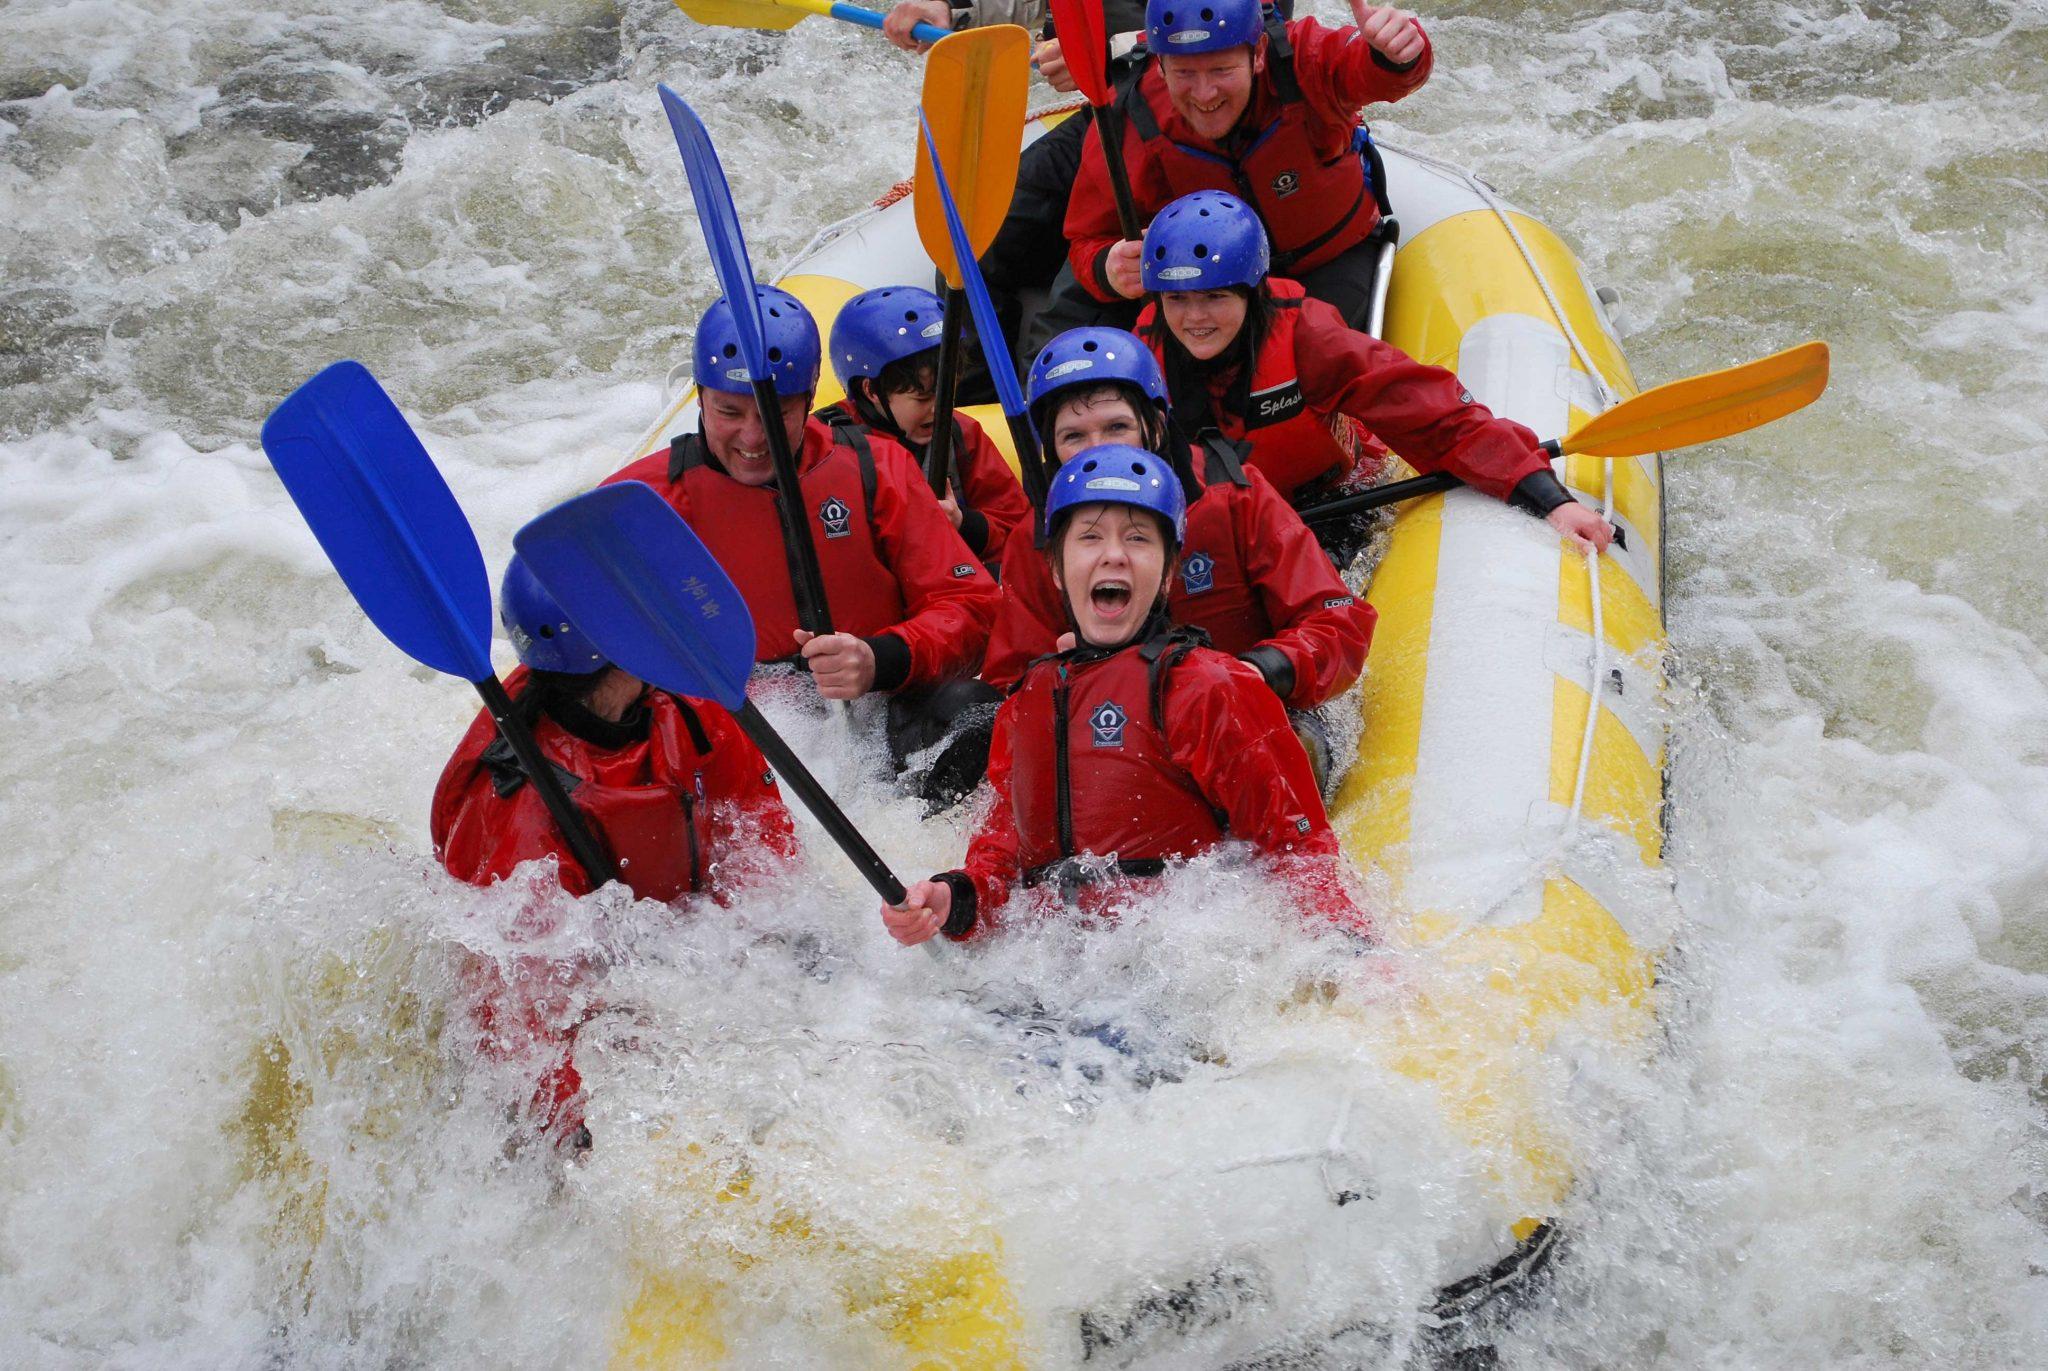 White Water Rafting Voucher